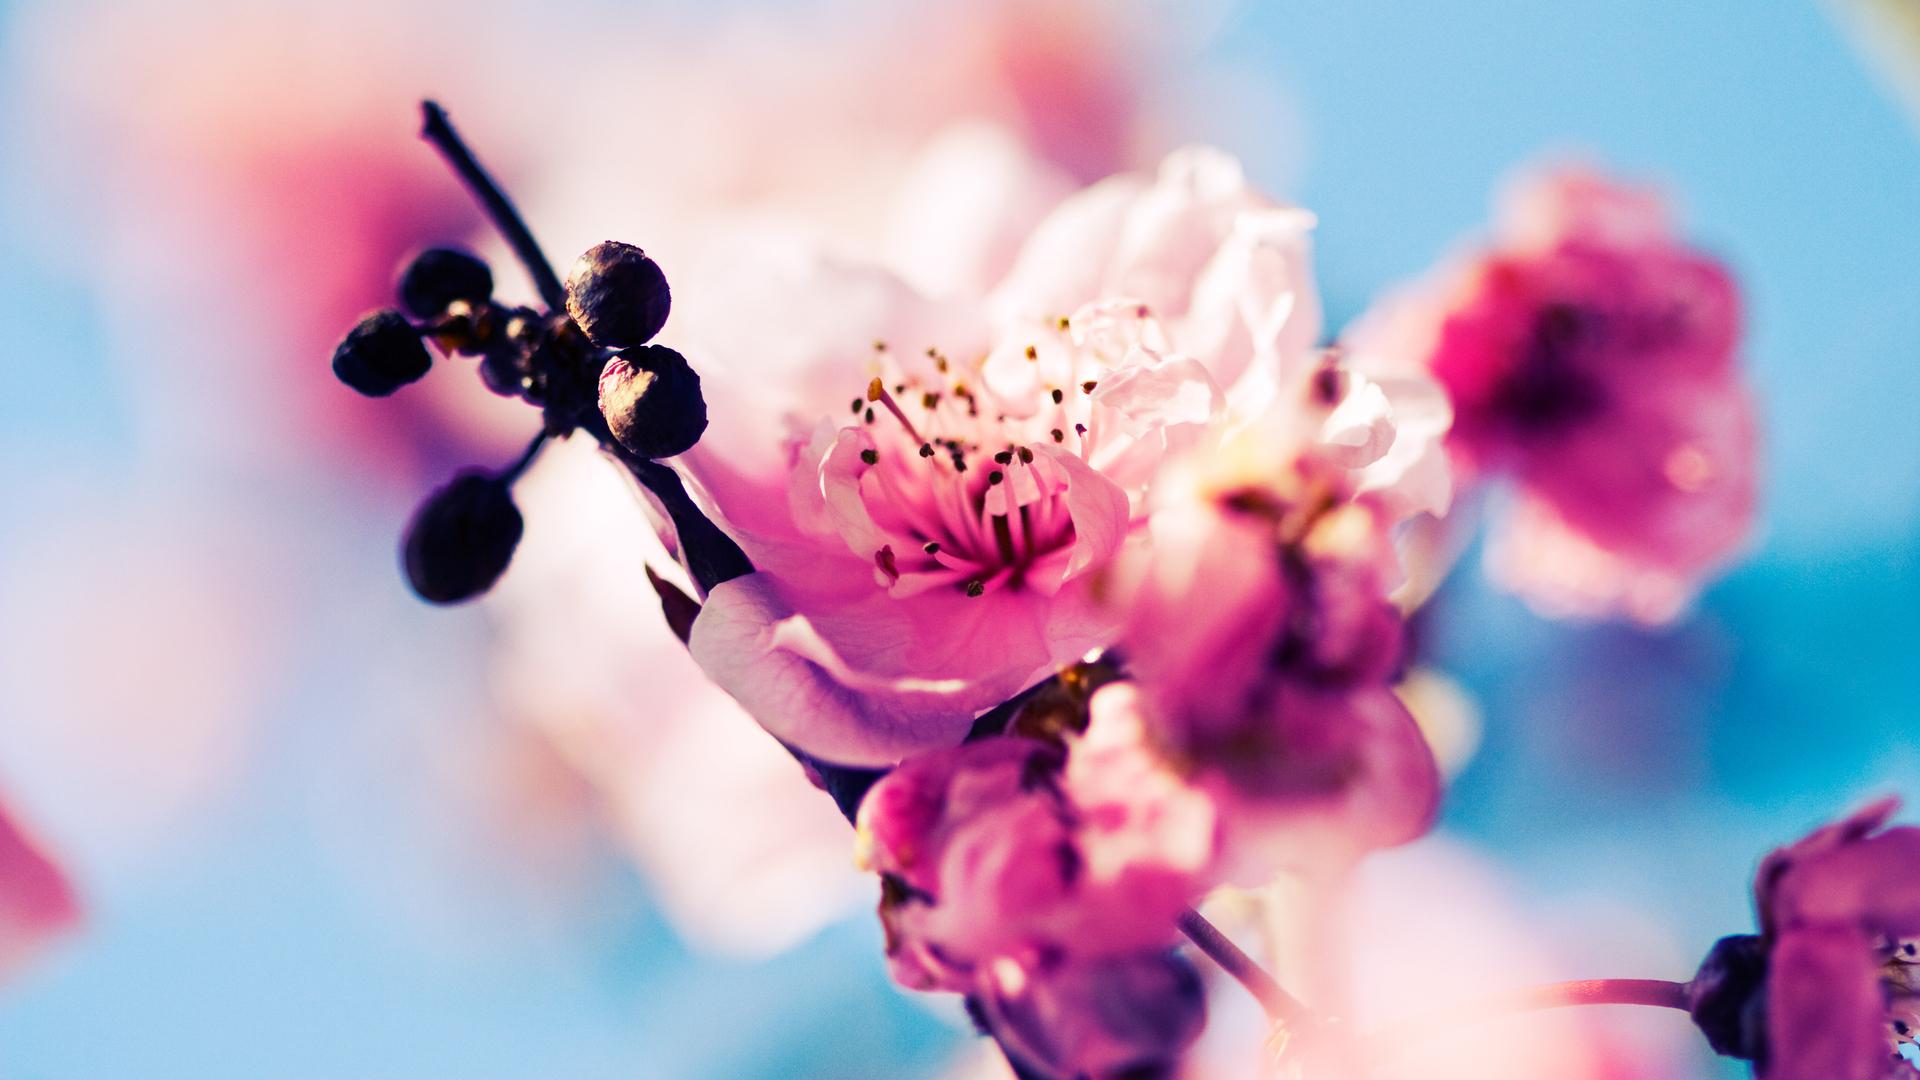 Hd Cherry Blossom - Desktop Wallpaper